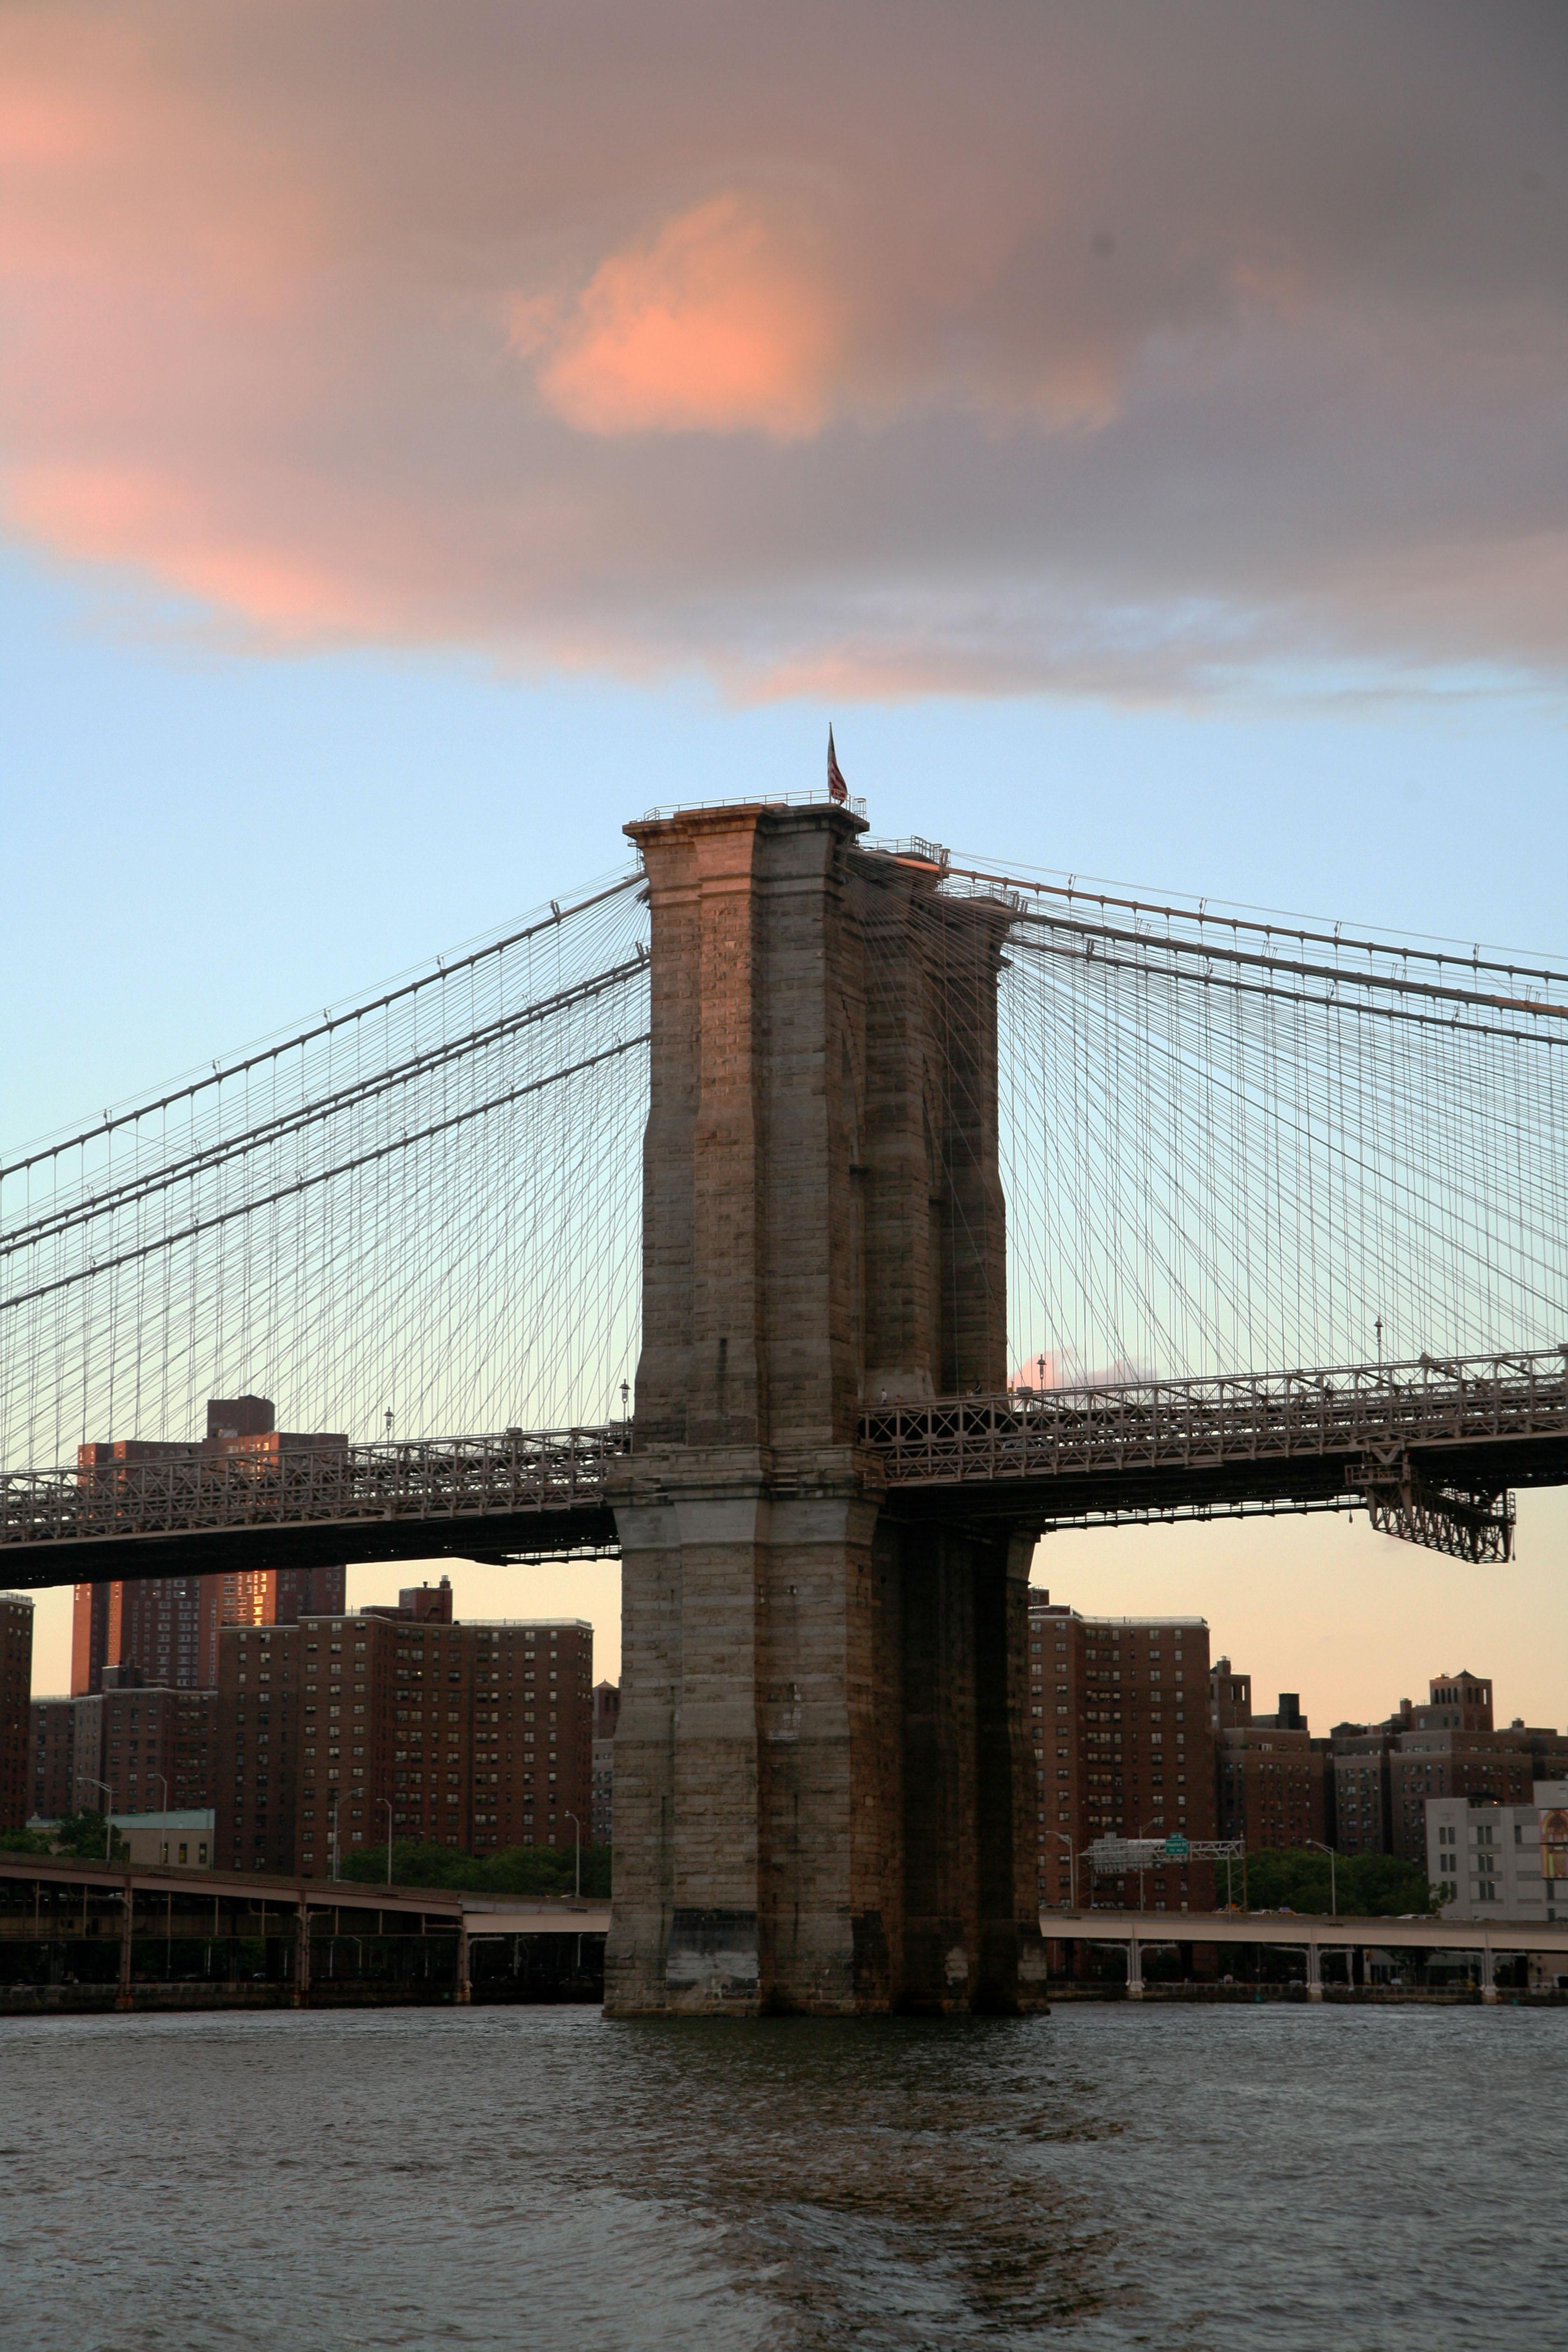 Ny bridge at sunset photo